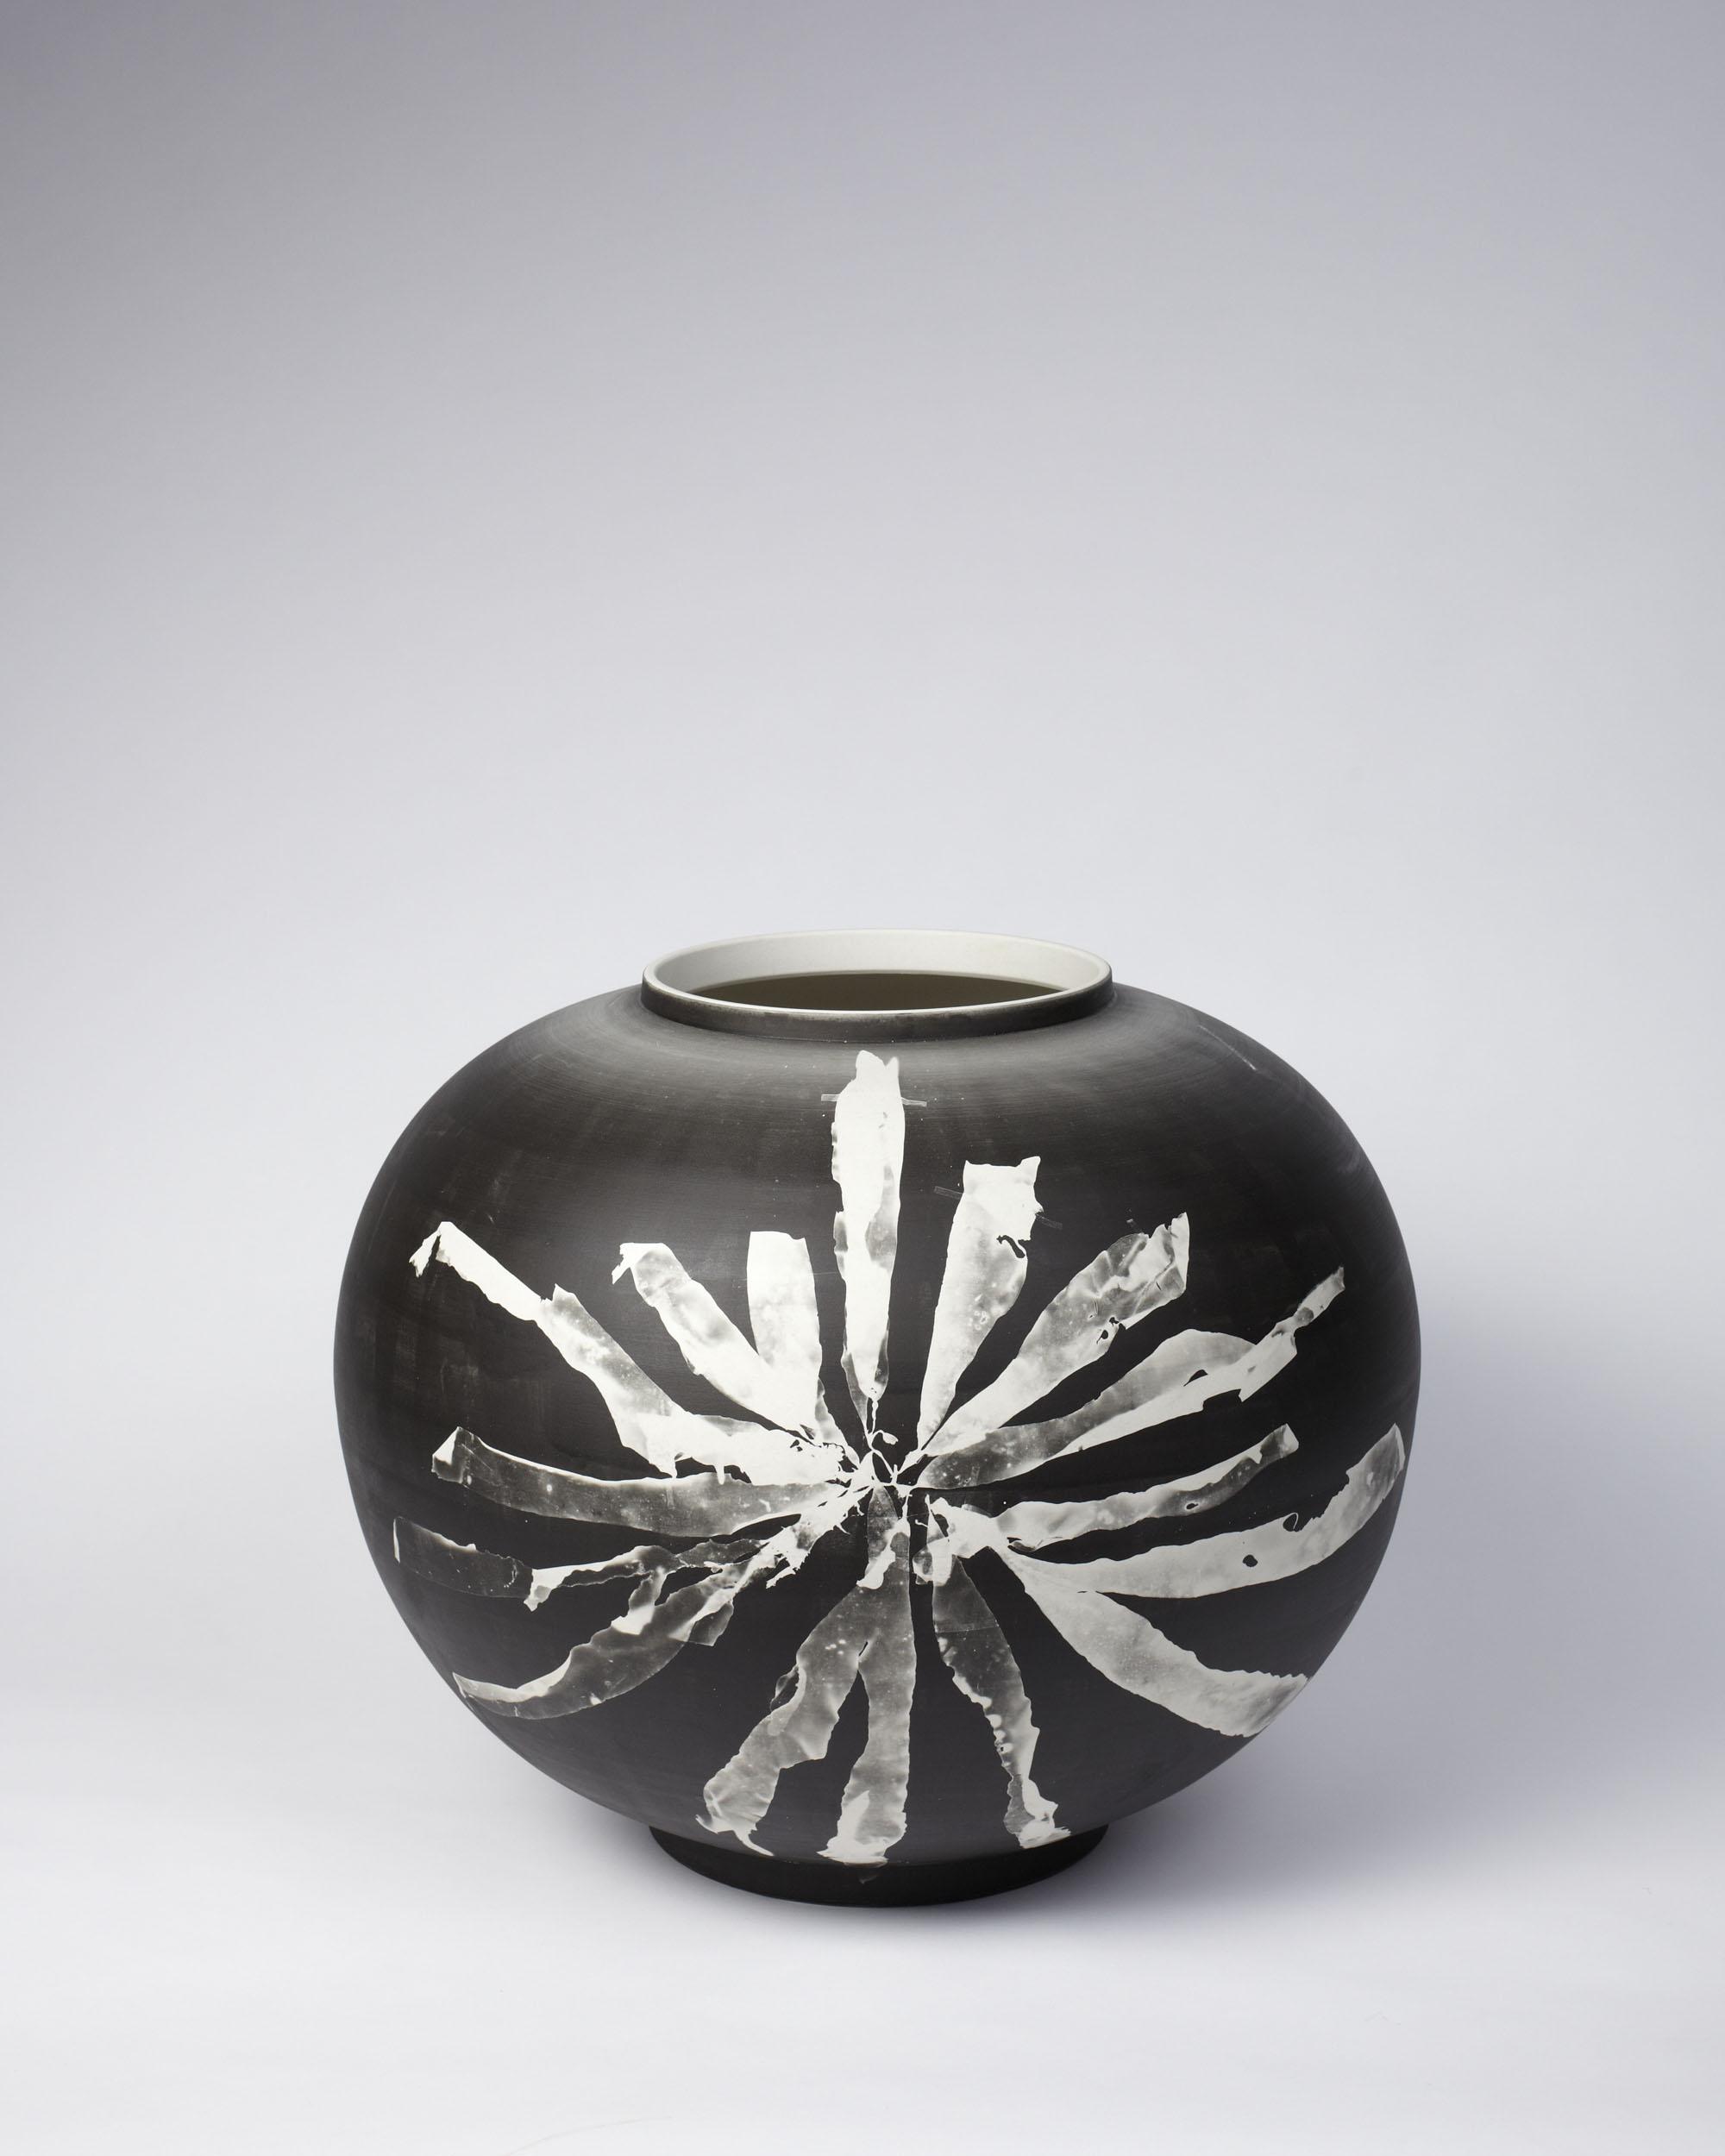 A round Silverware vase with silver gelatin photogram of foraged seaweed in spider composition